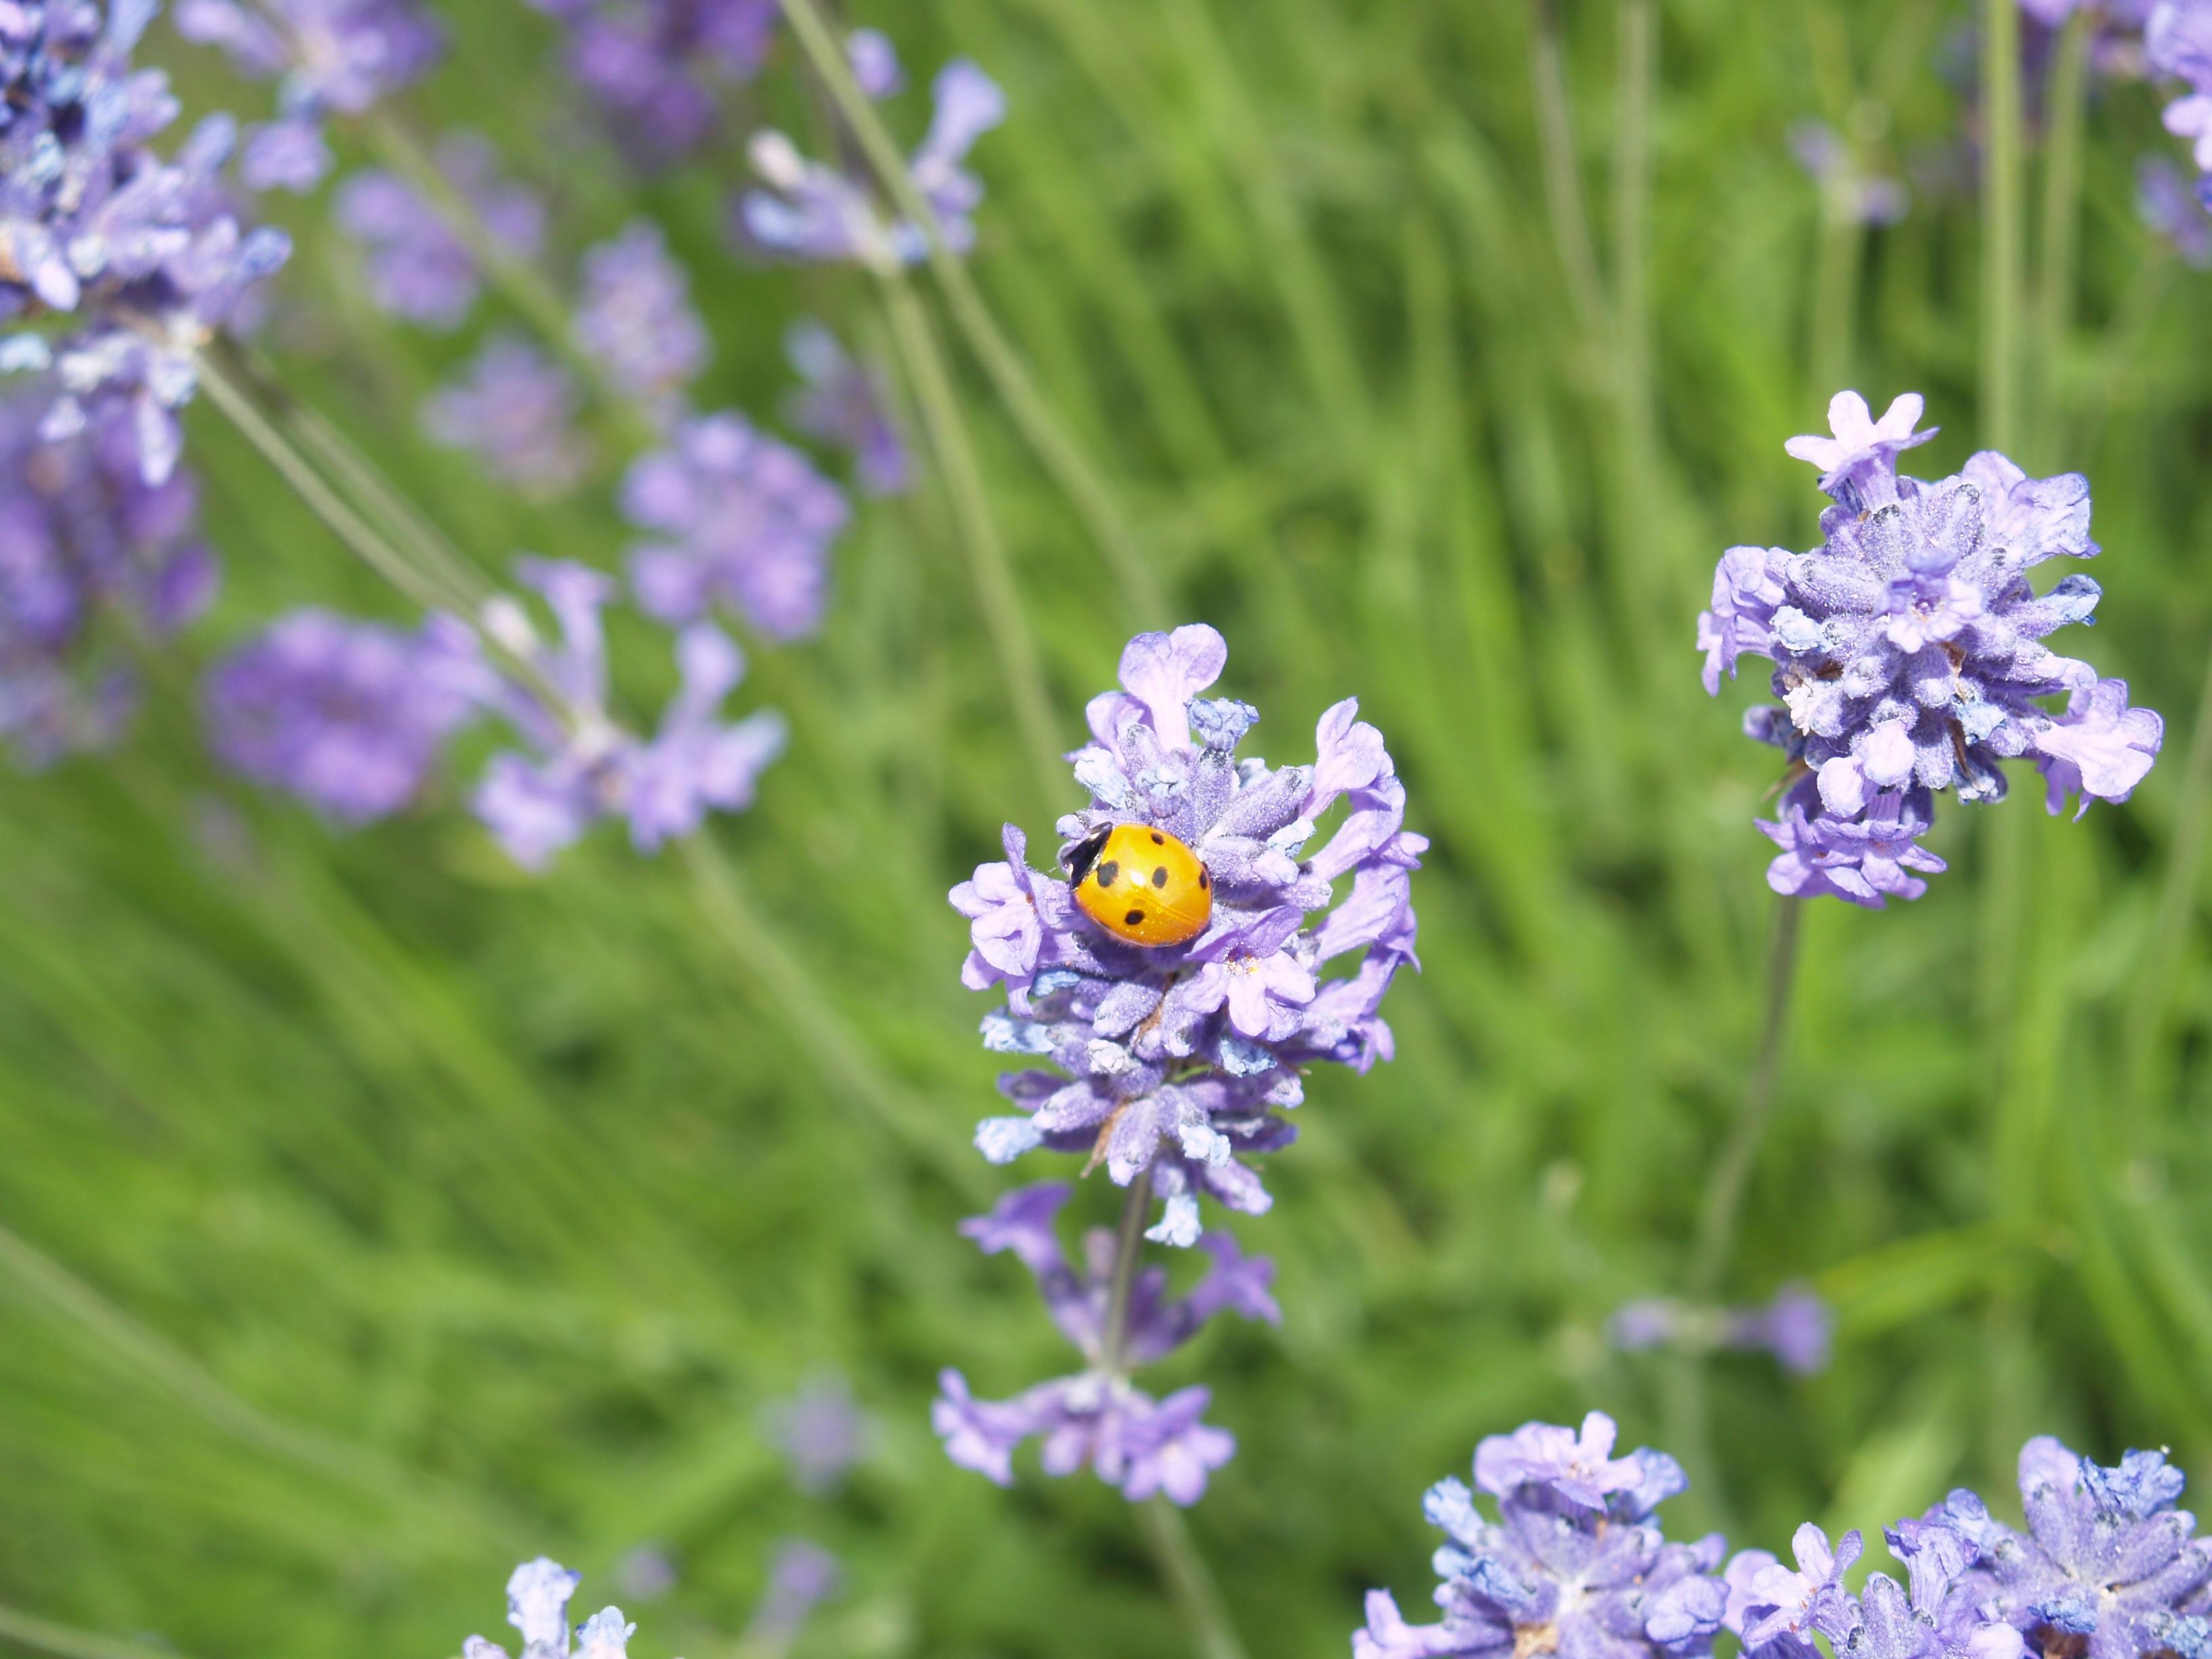 Ladybug Lavender